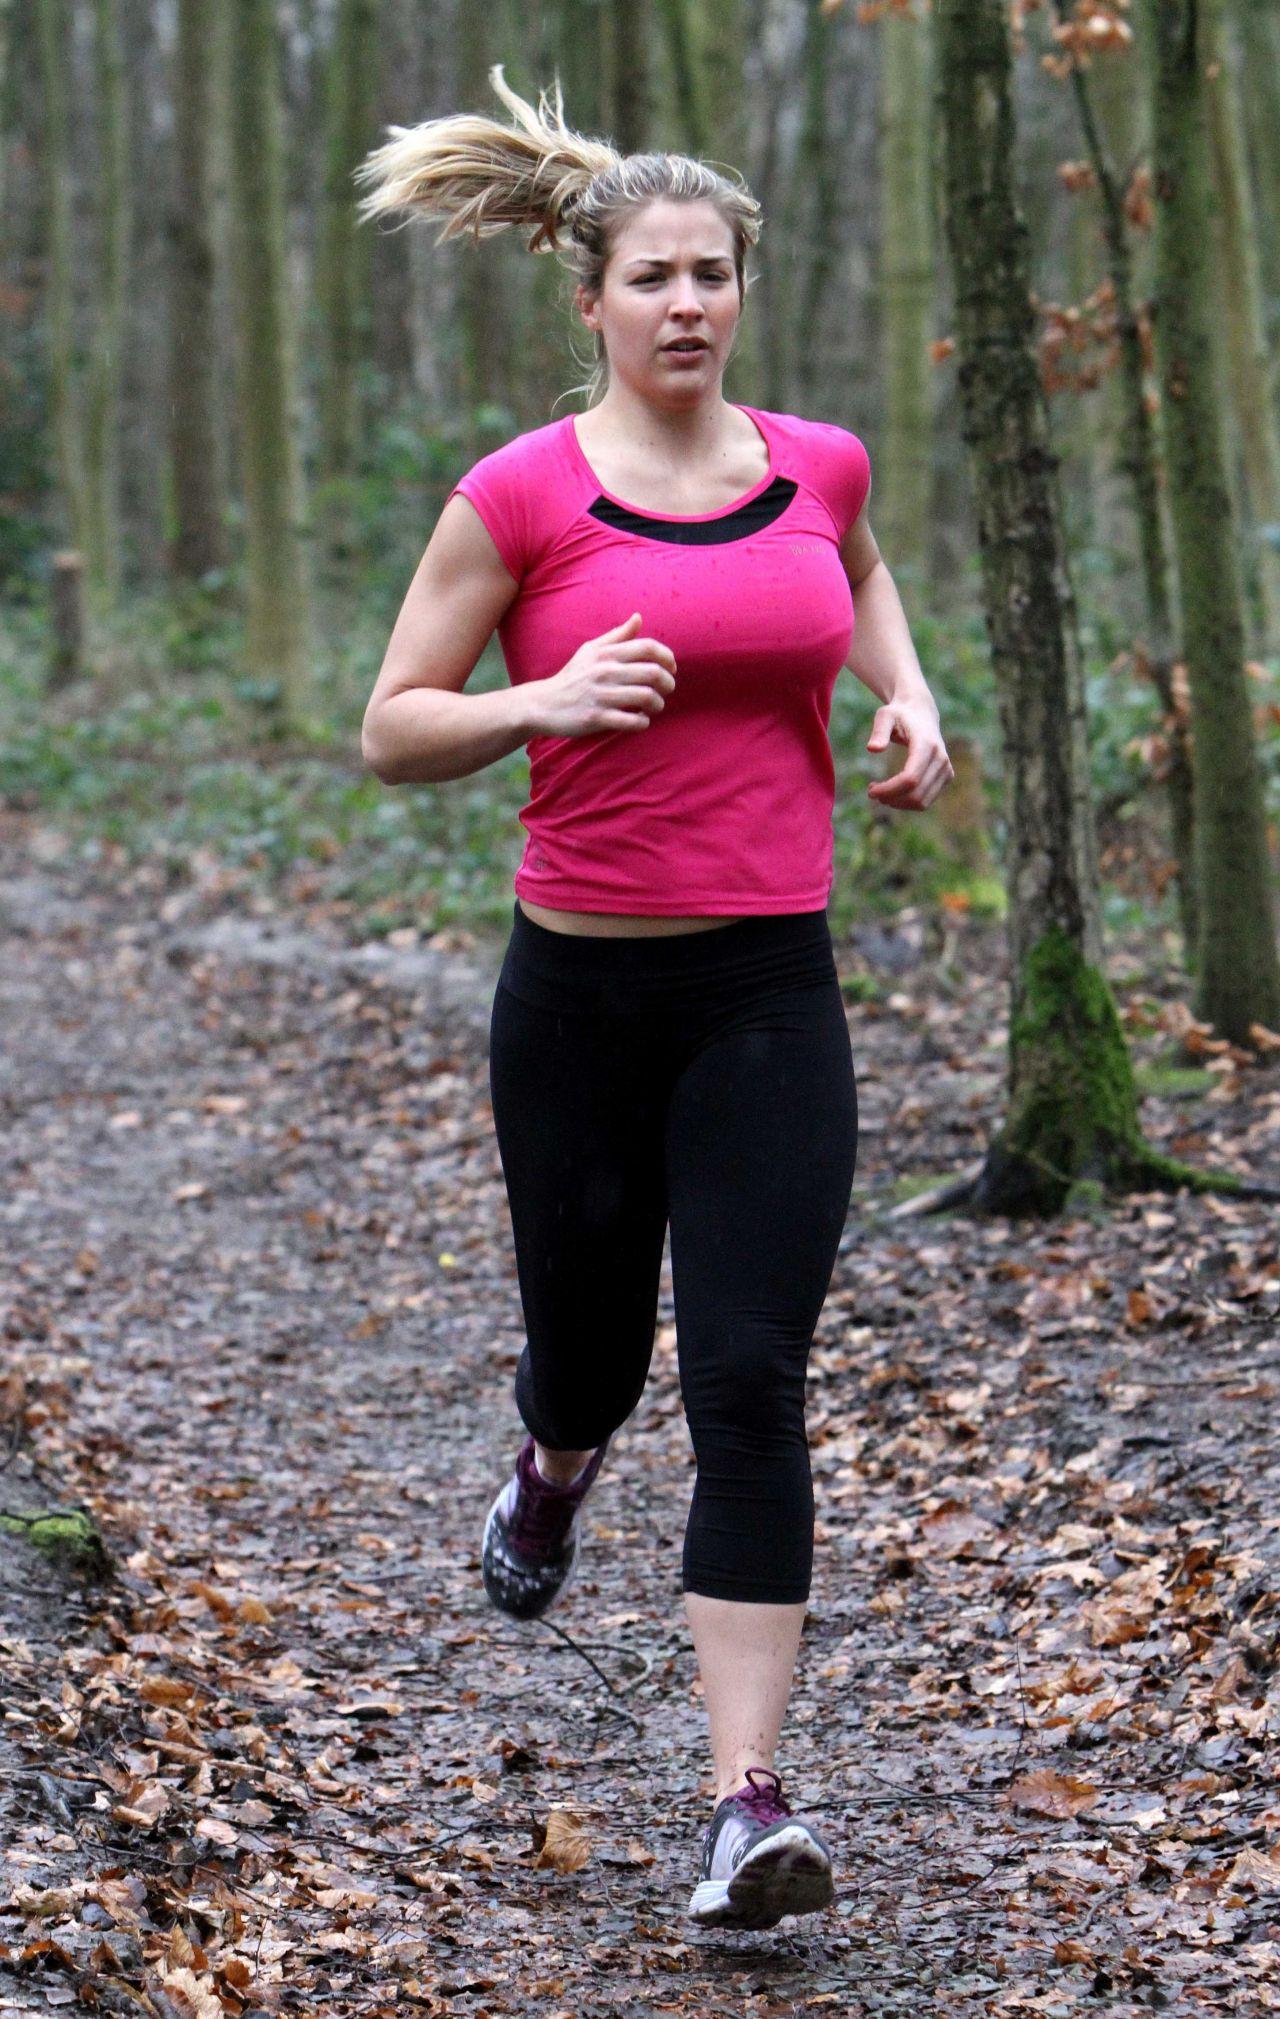 Gemma Atkinson Workout - Running in Forest Essex, January 2015